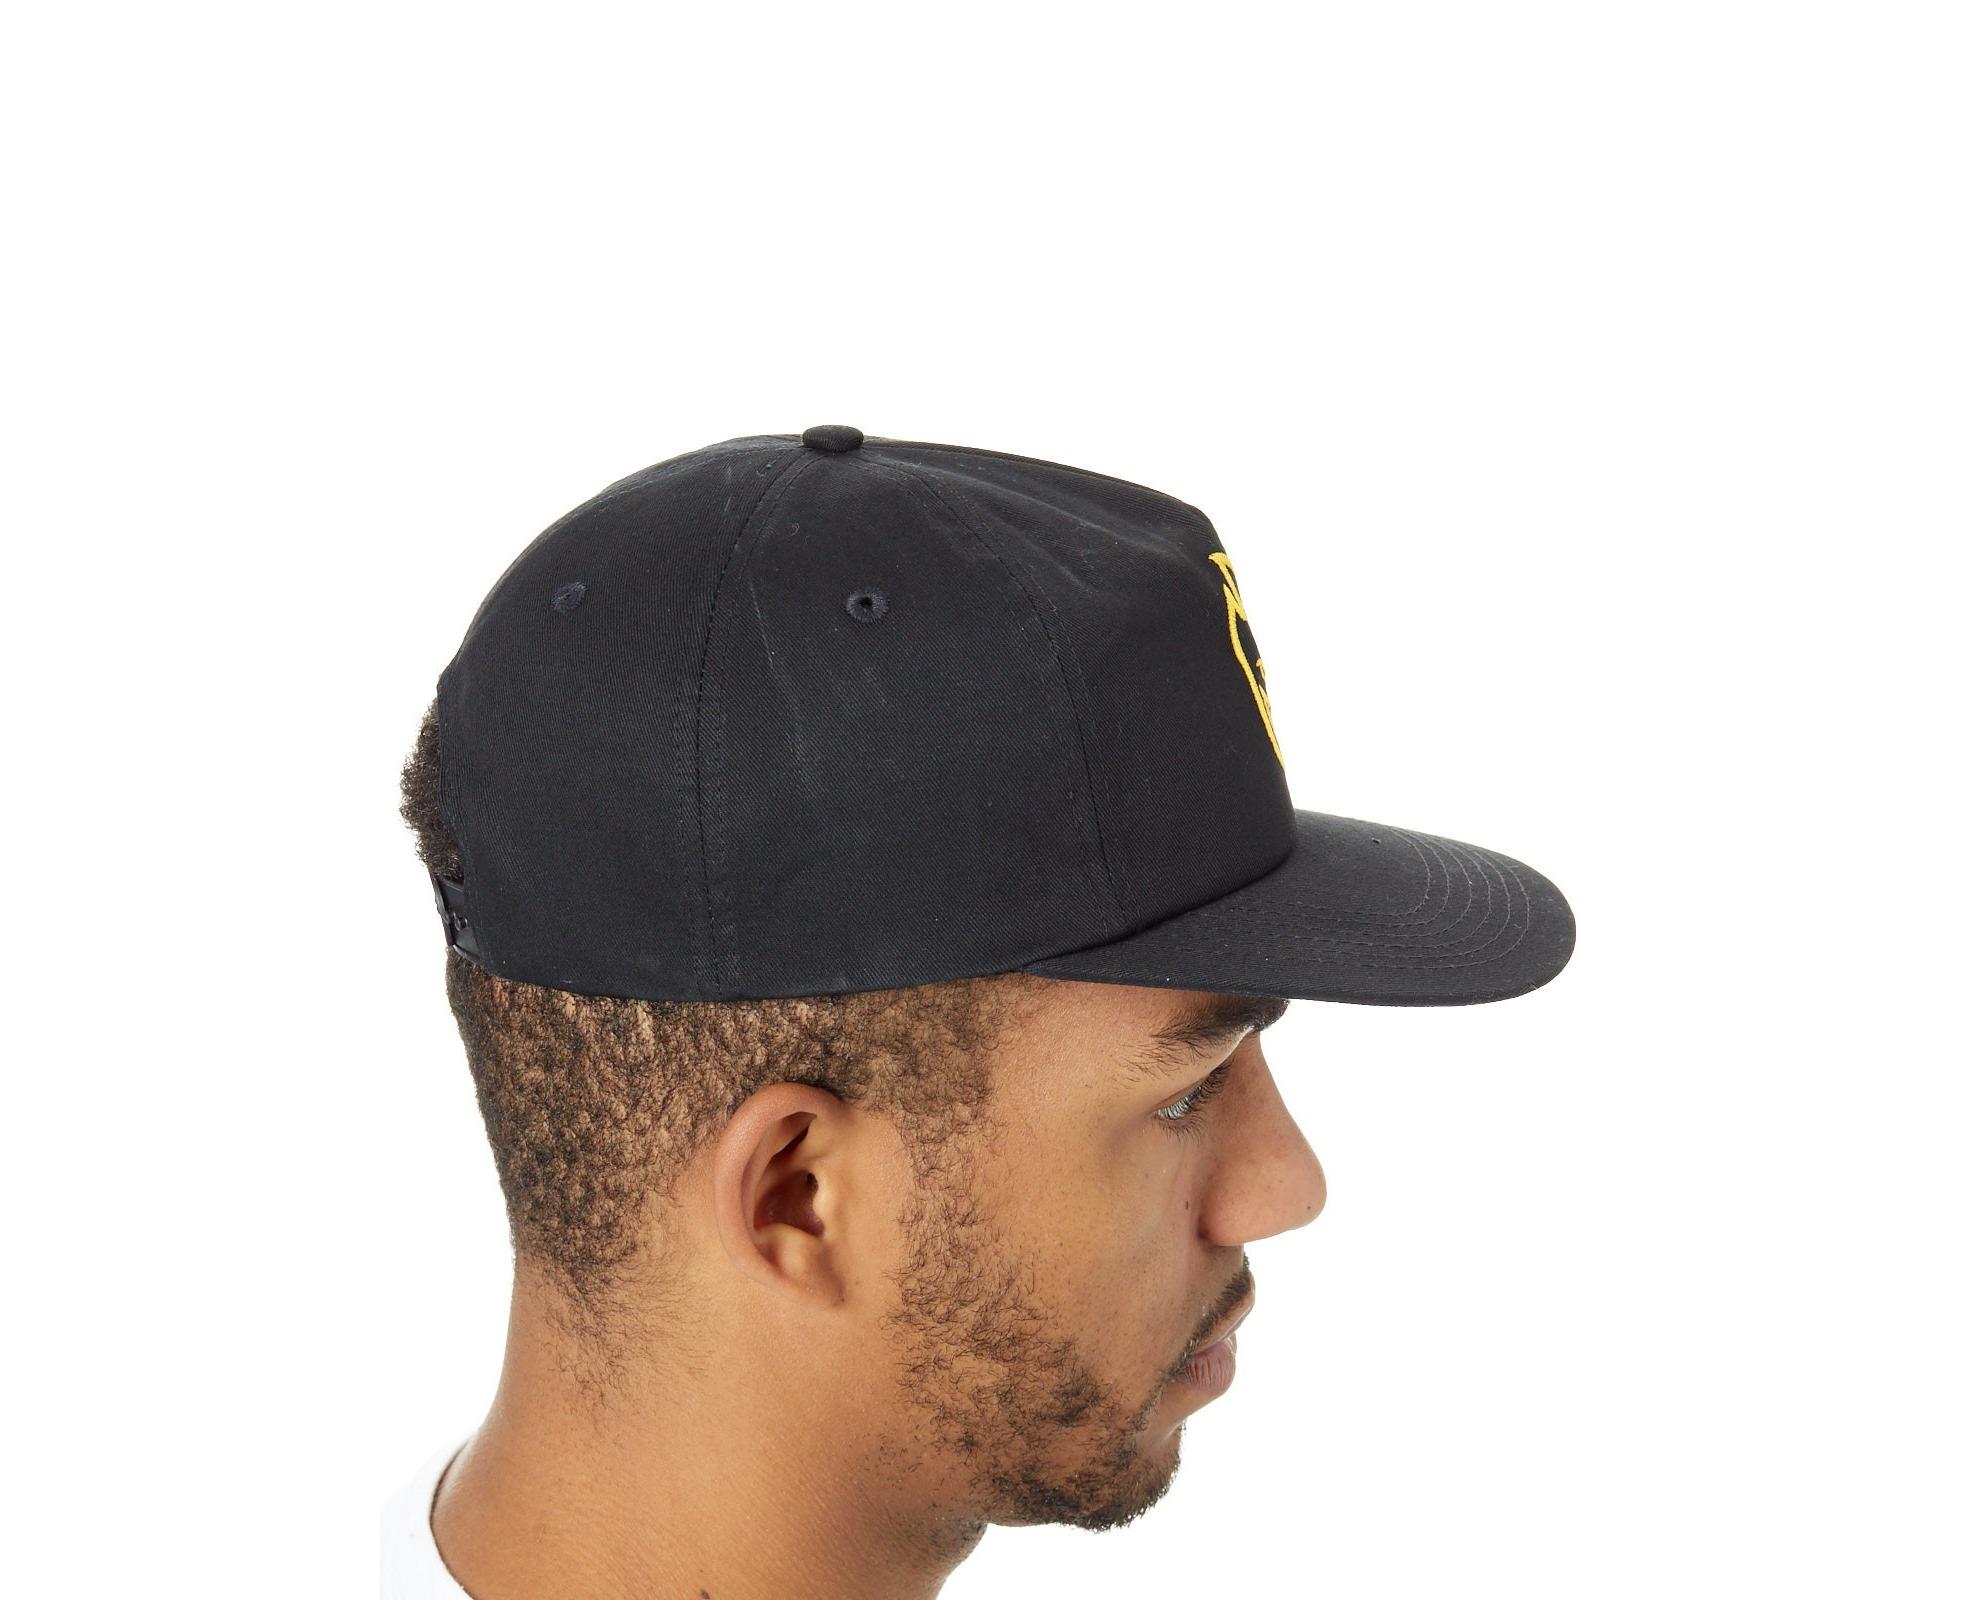 baaf0f42bad Spitfire Black-Yellow Bighead Snapback Cap